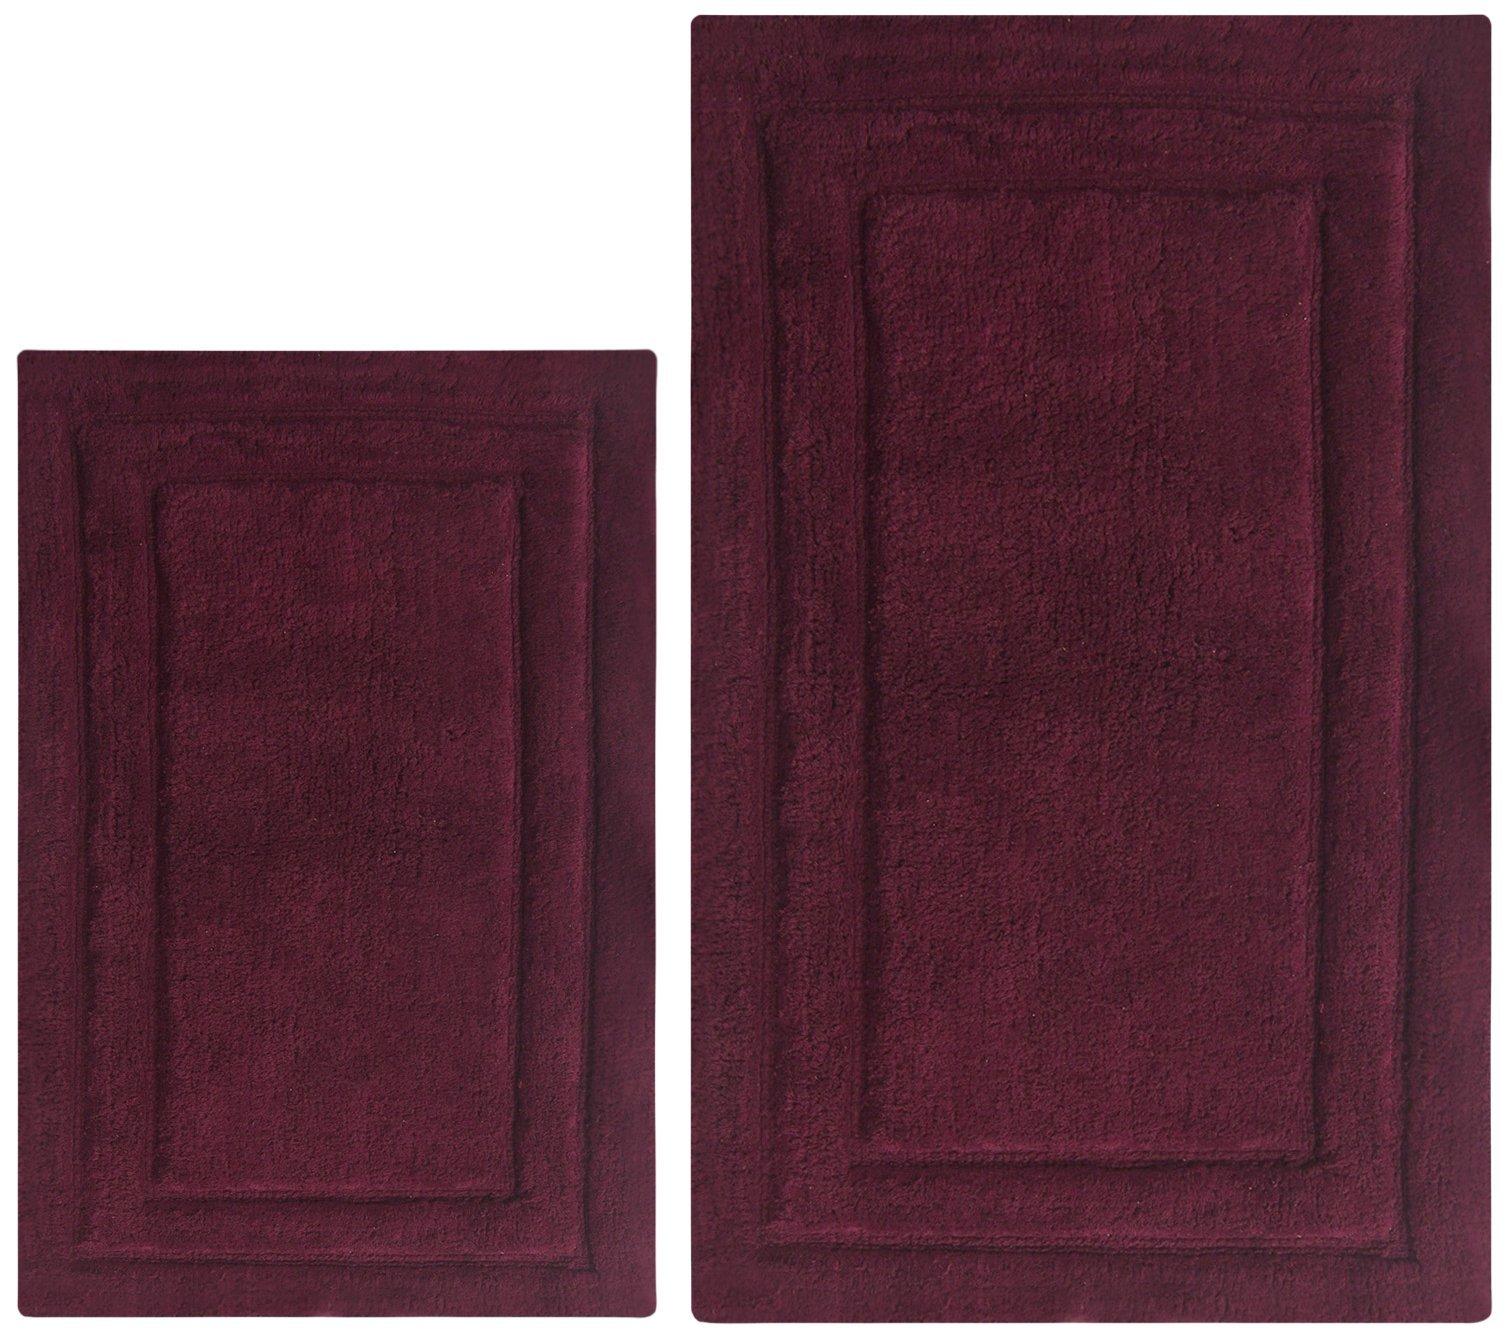 Chardin home 100% Cotton two Piece Classicc Bath Rug Set, (21''x34'' & 17''x24'') with anti-skid spray latex back, Burgundy